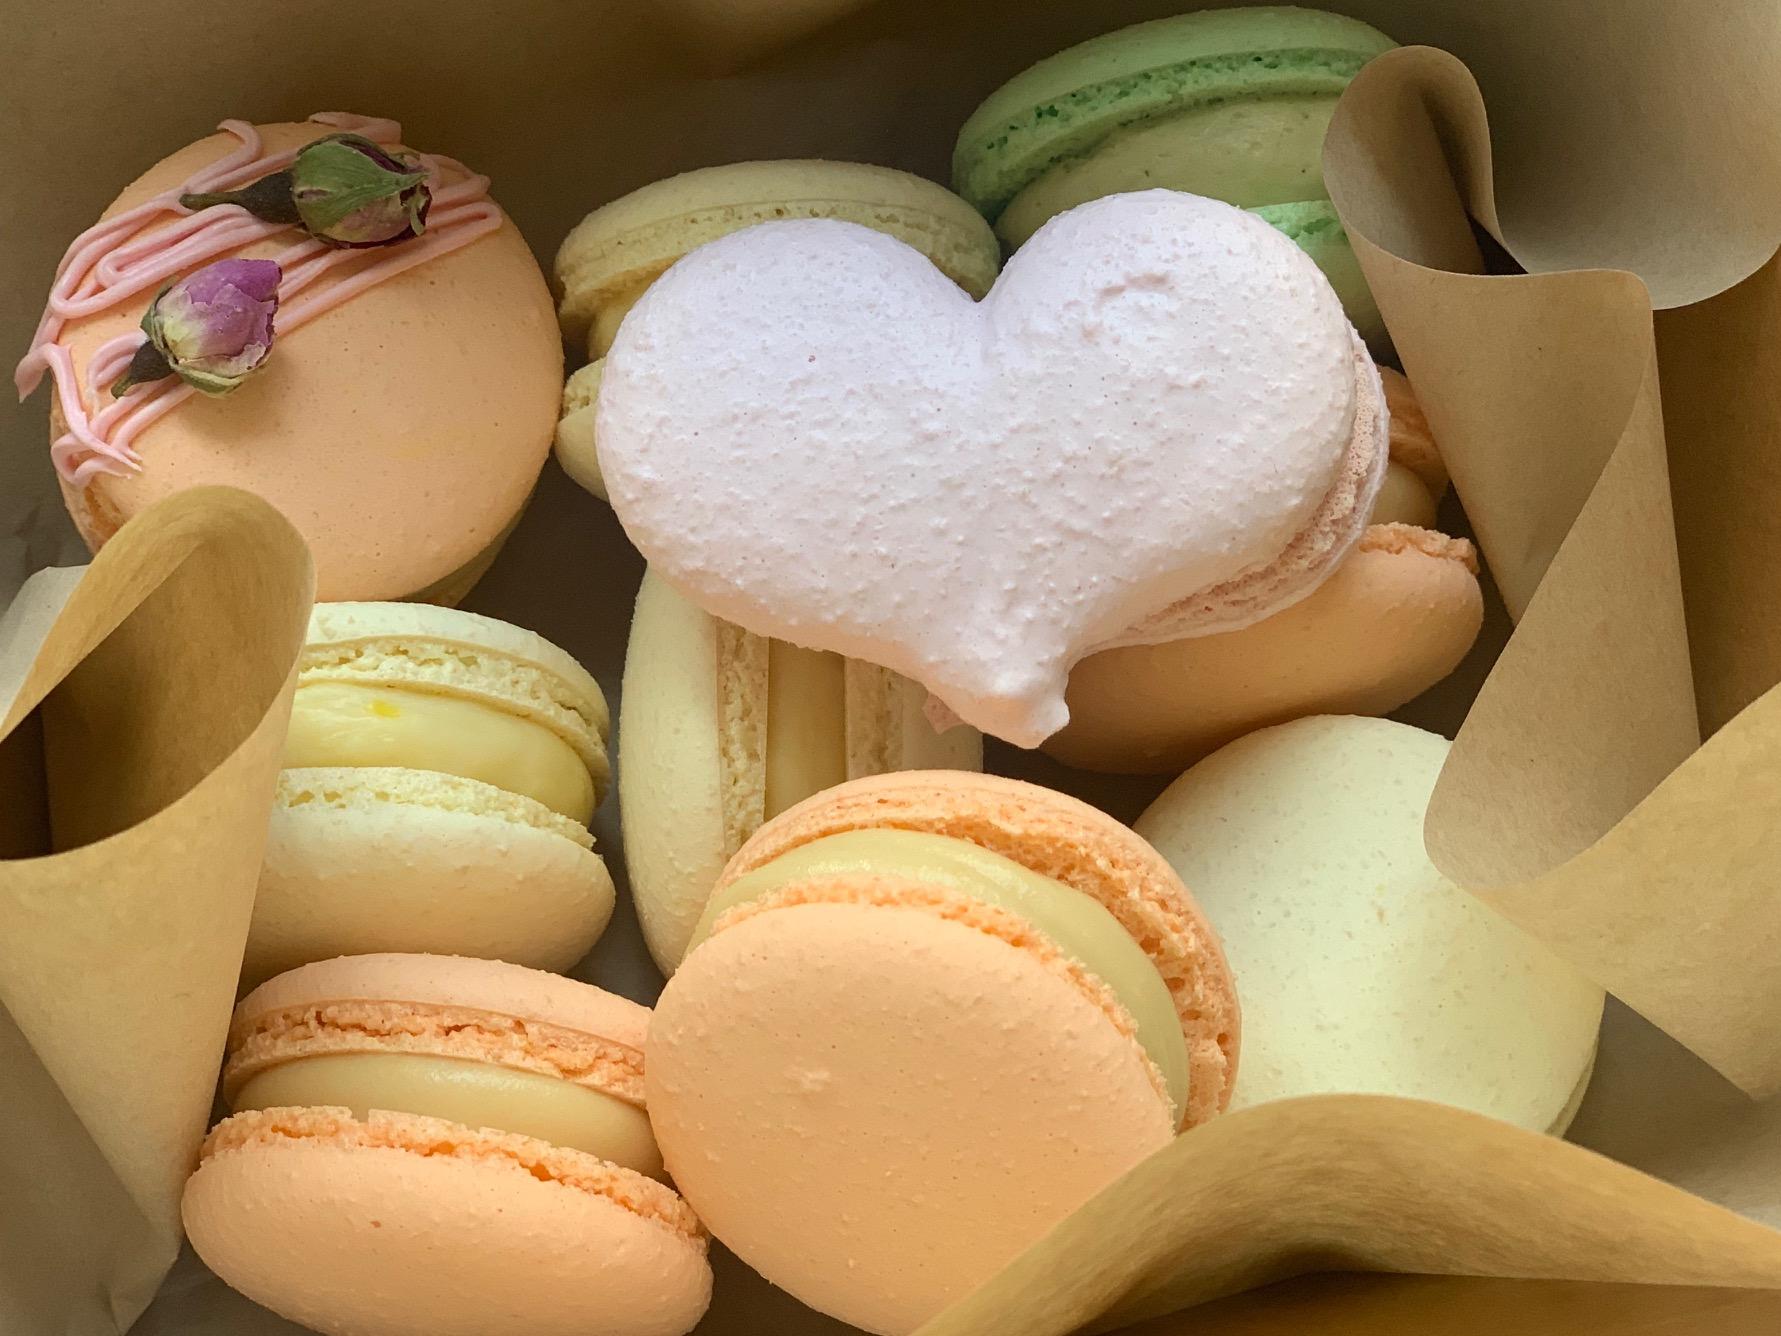 Box: Macaron Herzbox